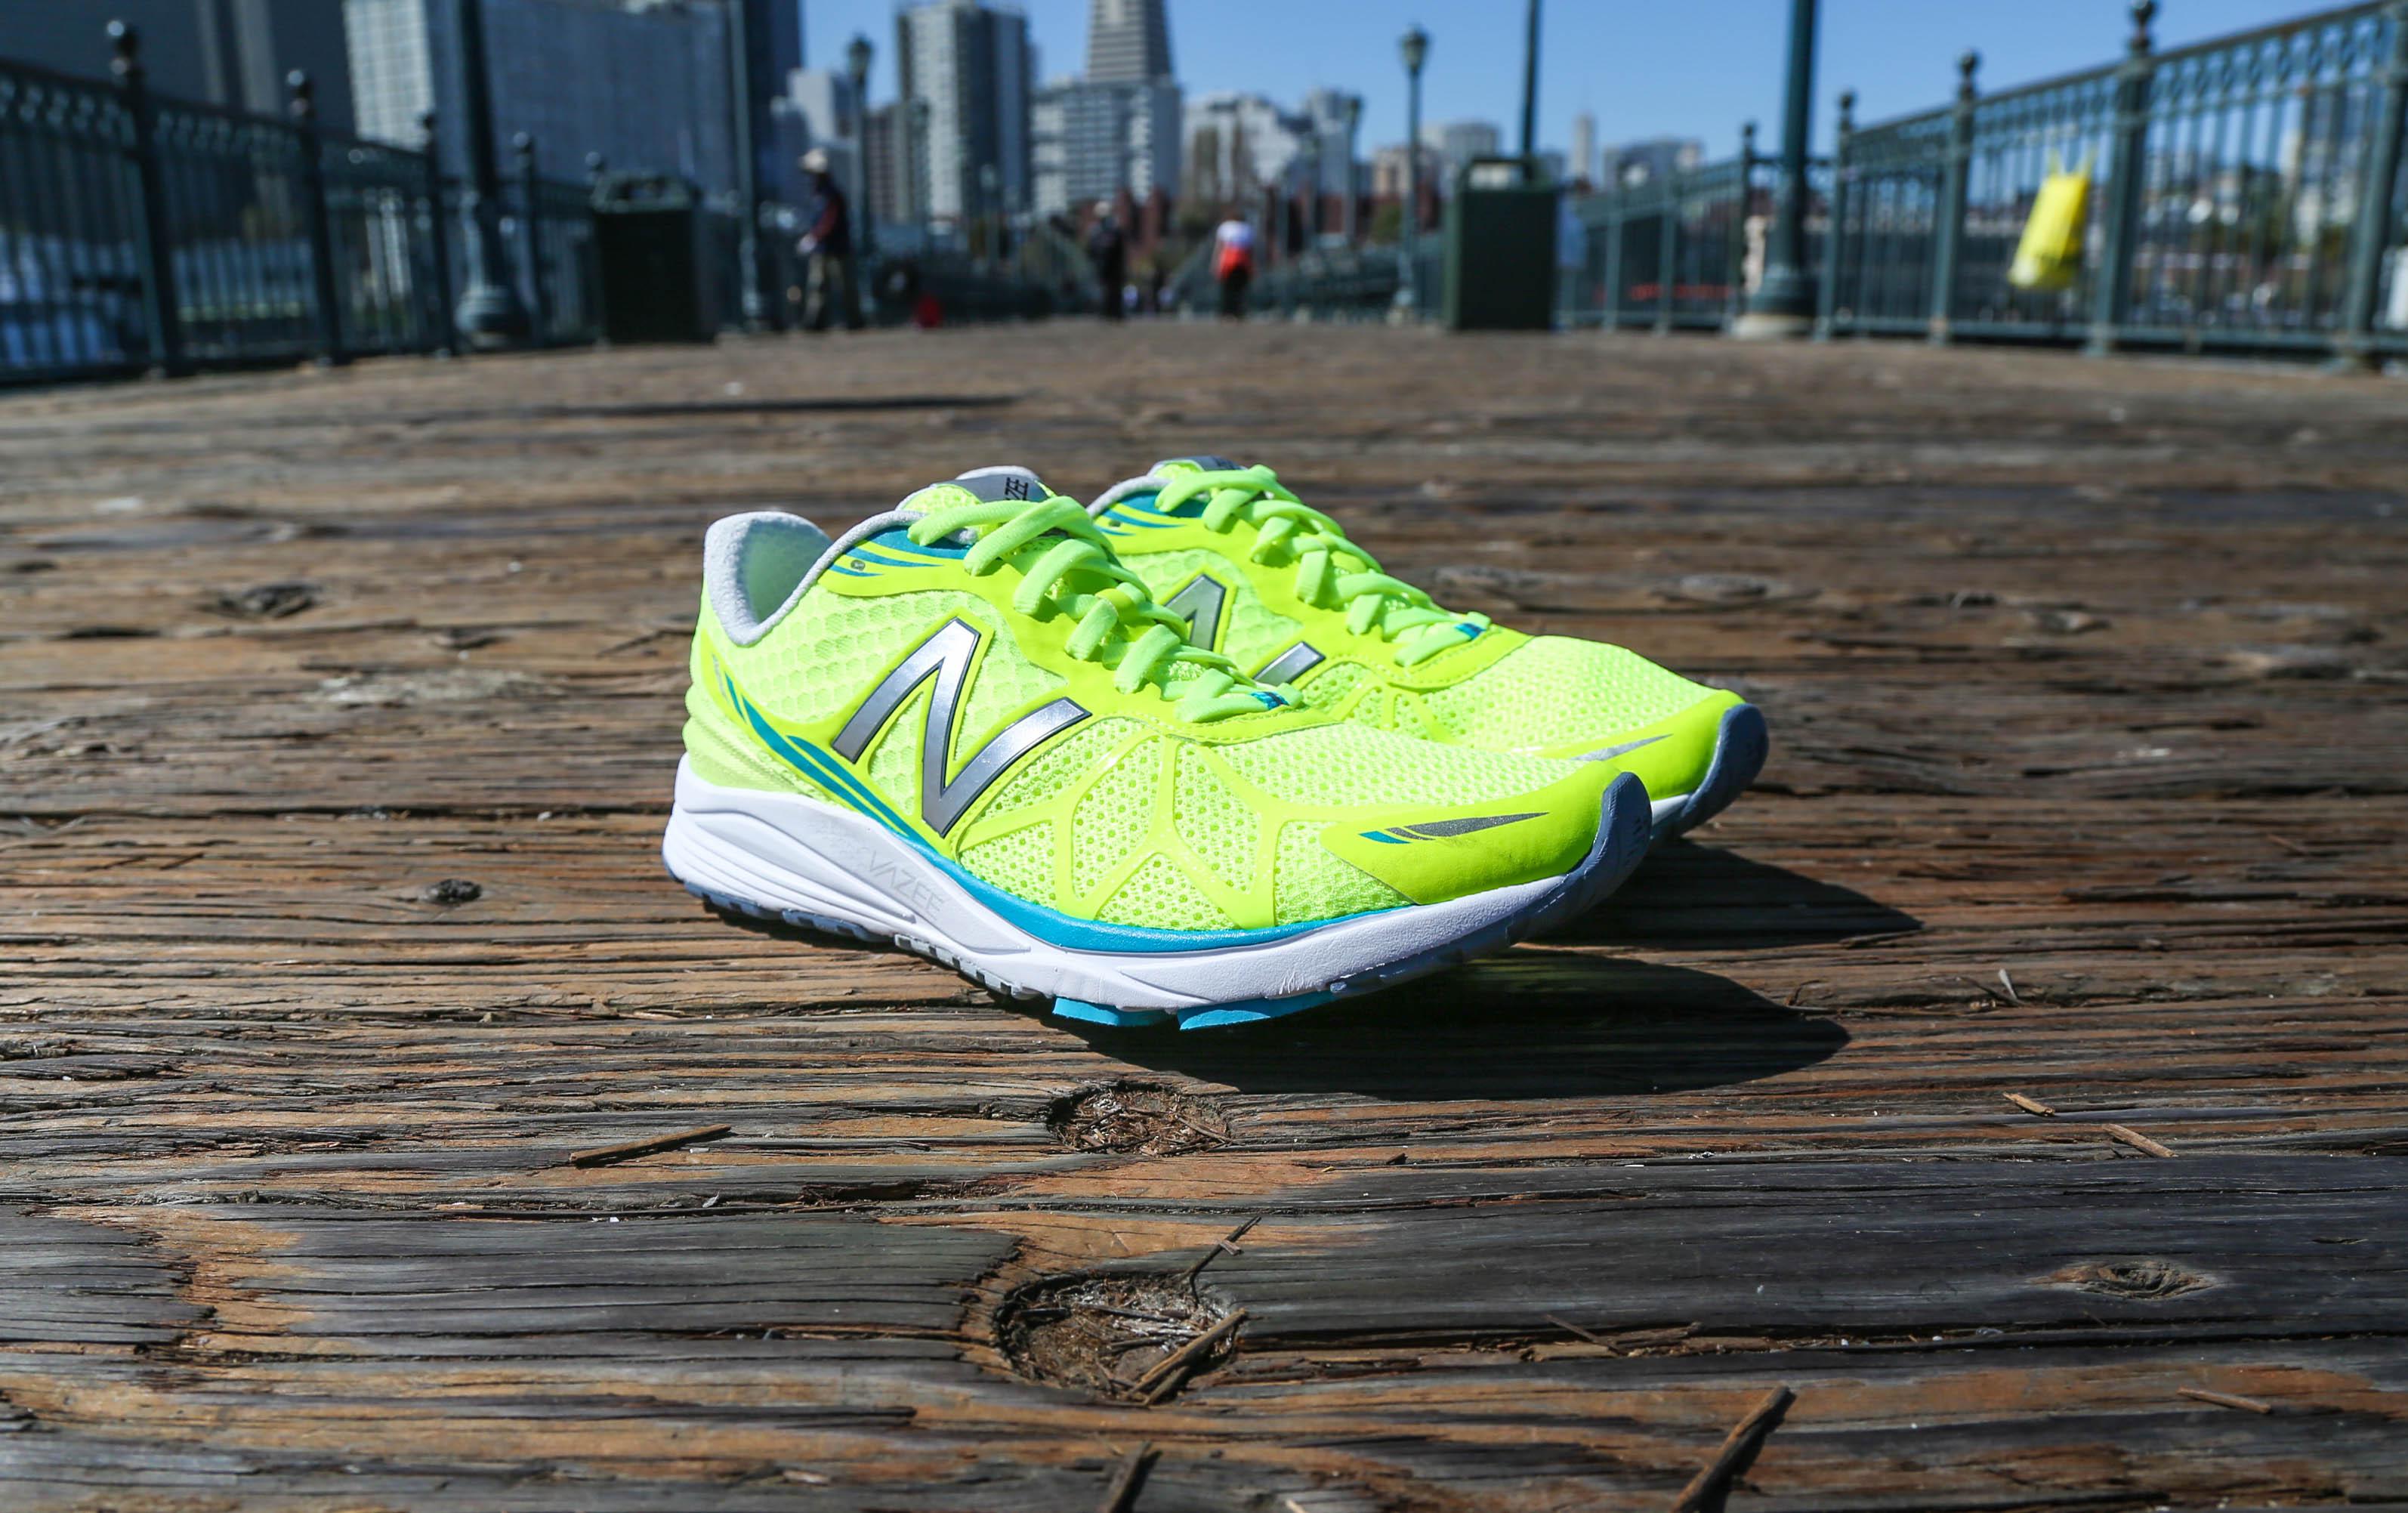 ????????????? ,Vazee系列跑鞋共推出PACE、RUSH與COAST三款專業跑鞋,